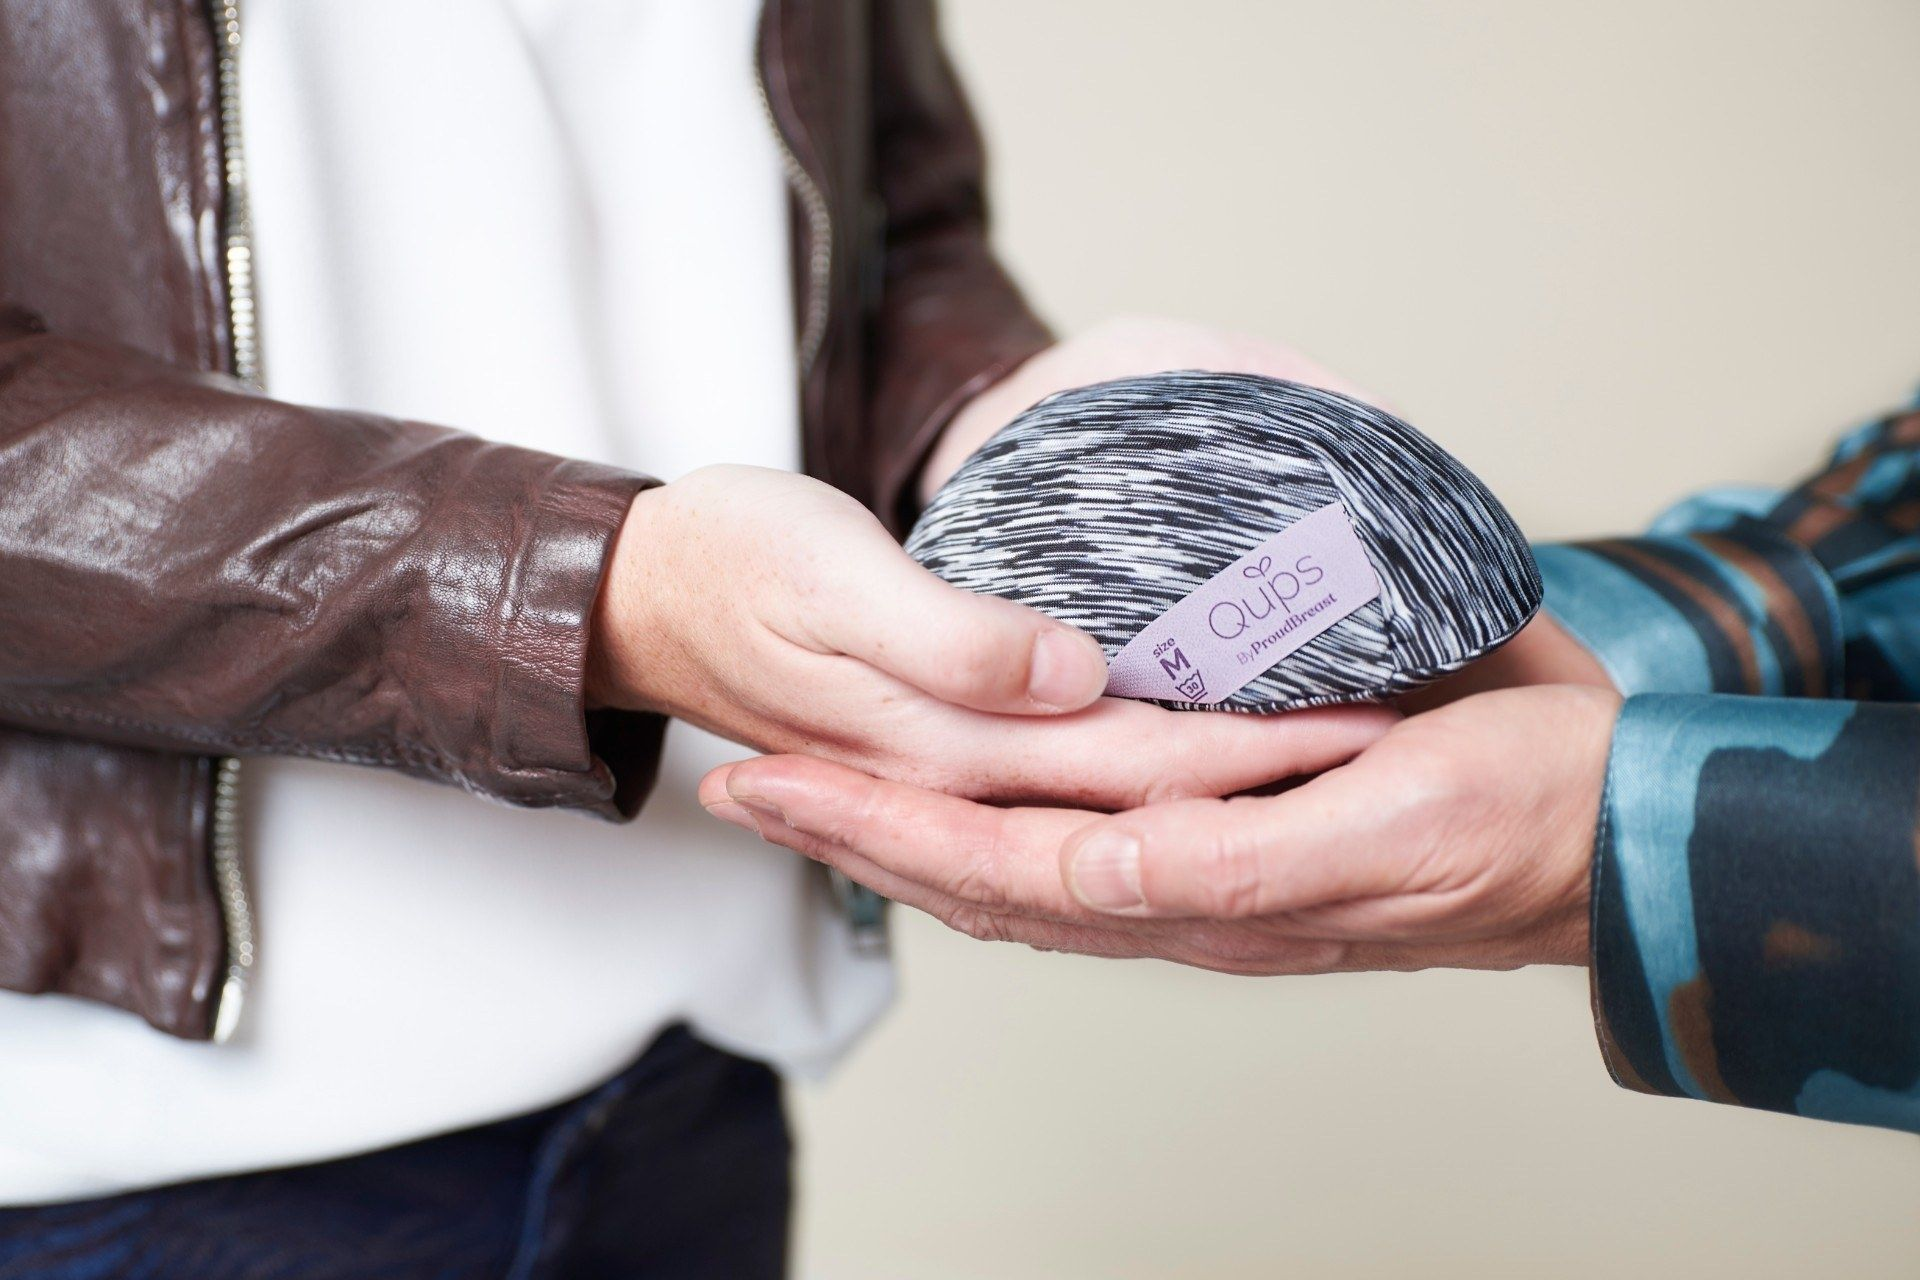 Duizenden vrouwen profiteren prothese investering dragons den 1